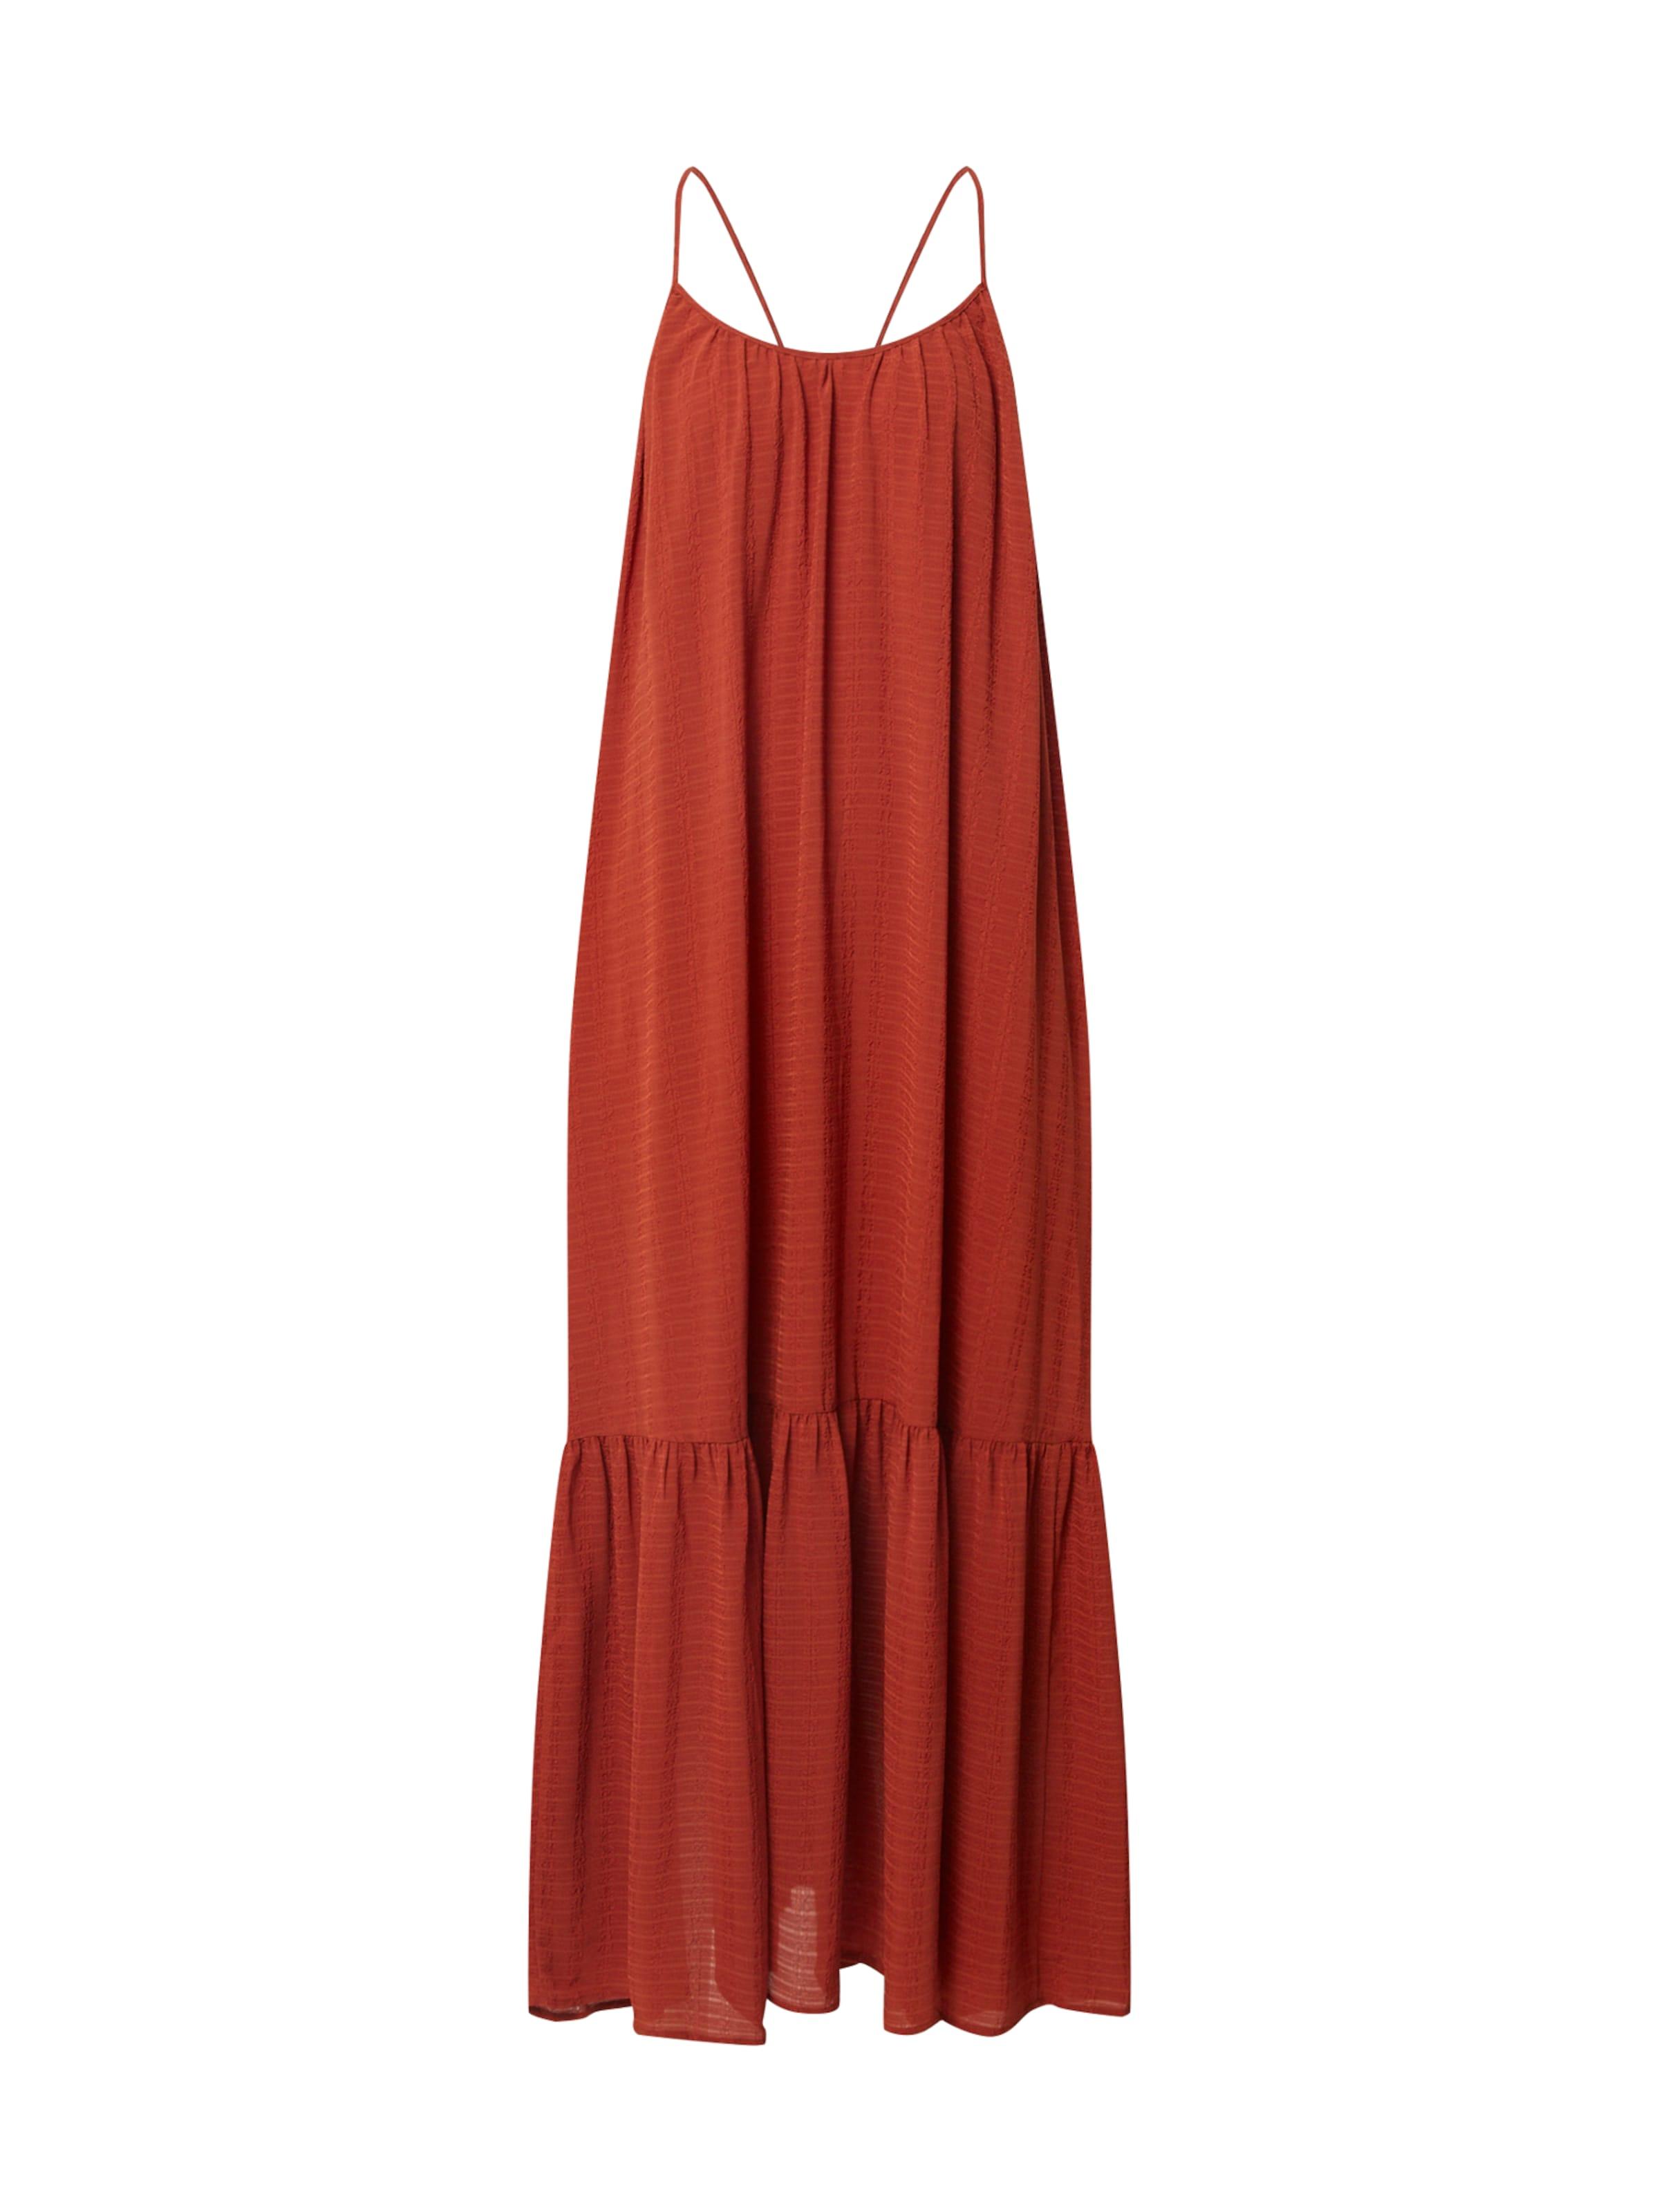 Samsoe Samsoe Robe Como long dress 12697 en lie de vin Hh3Plj